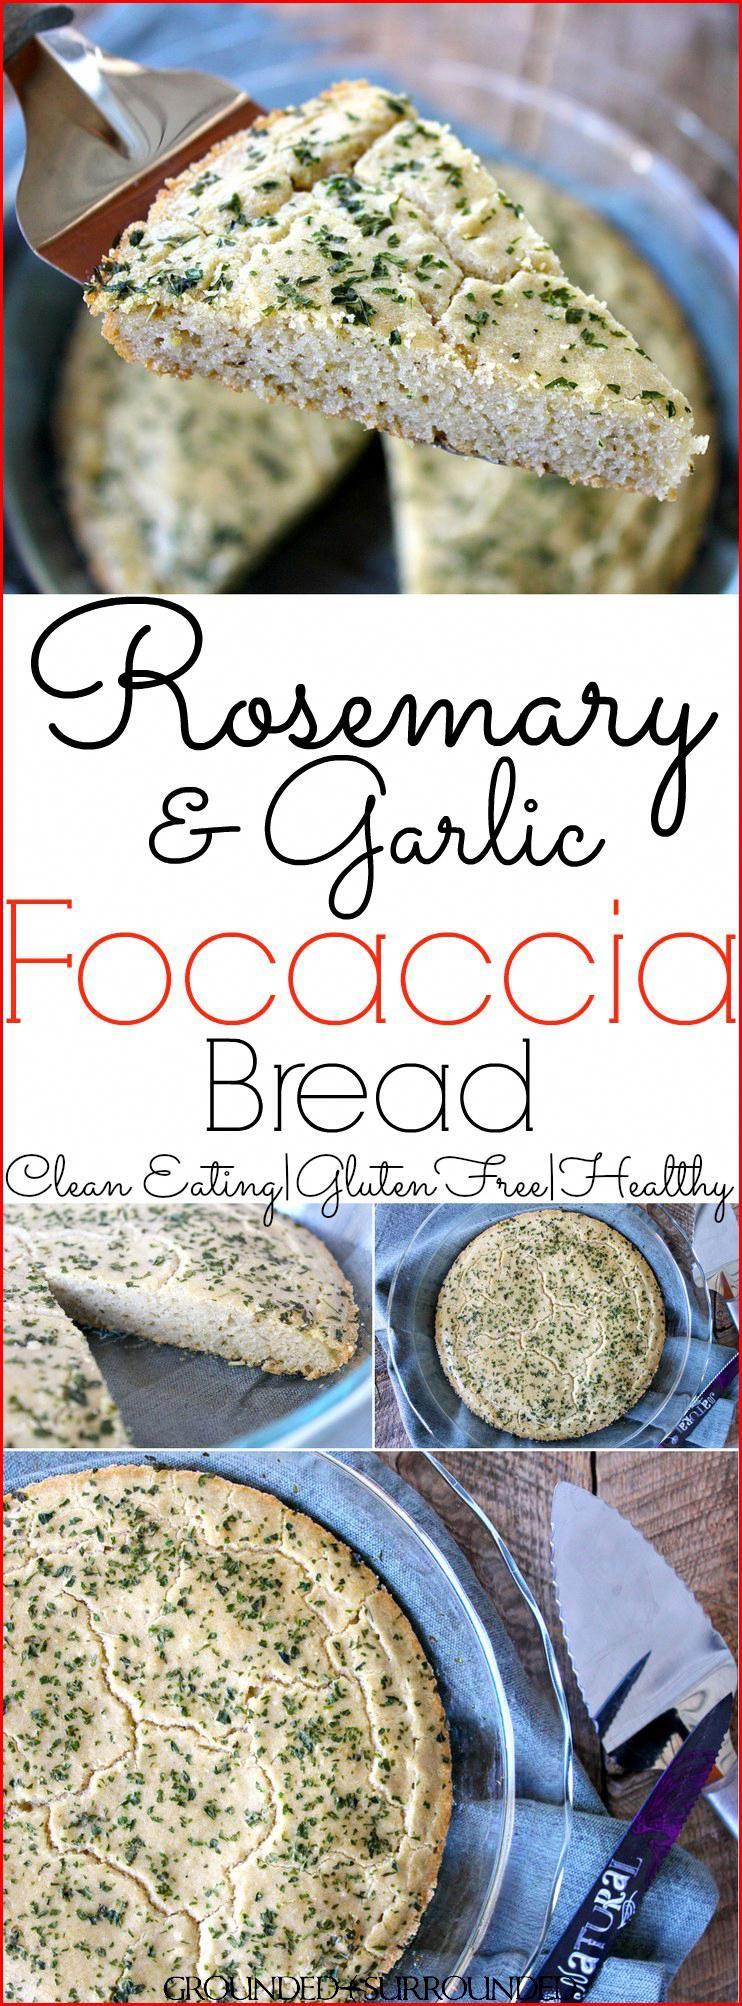 Gluten free dough best gluten free bread recipe